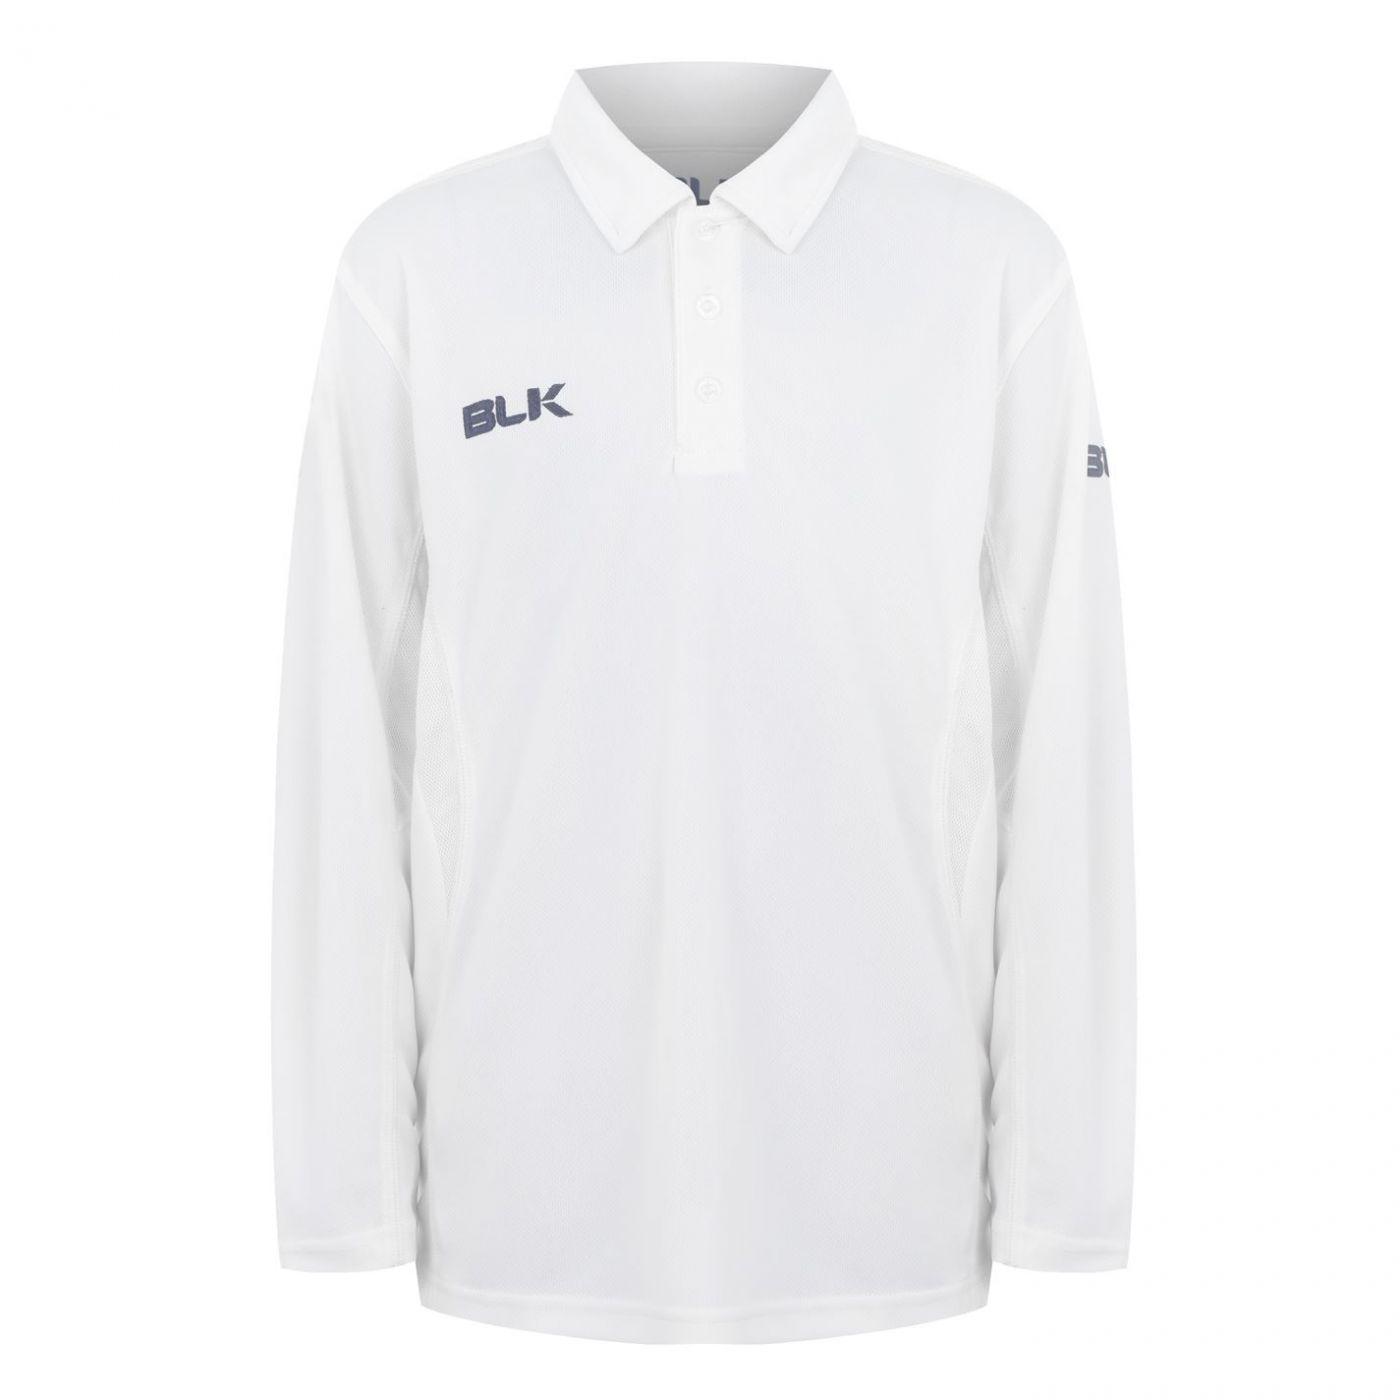 BLK Boys Long Sleeve Polo